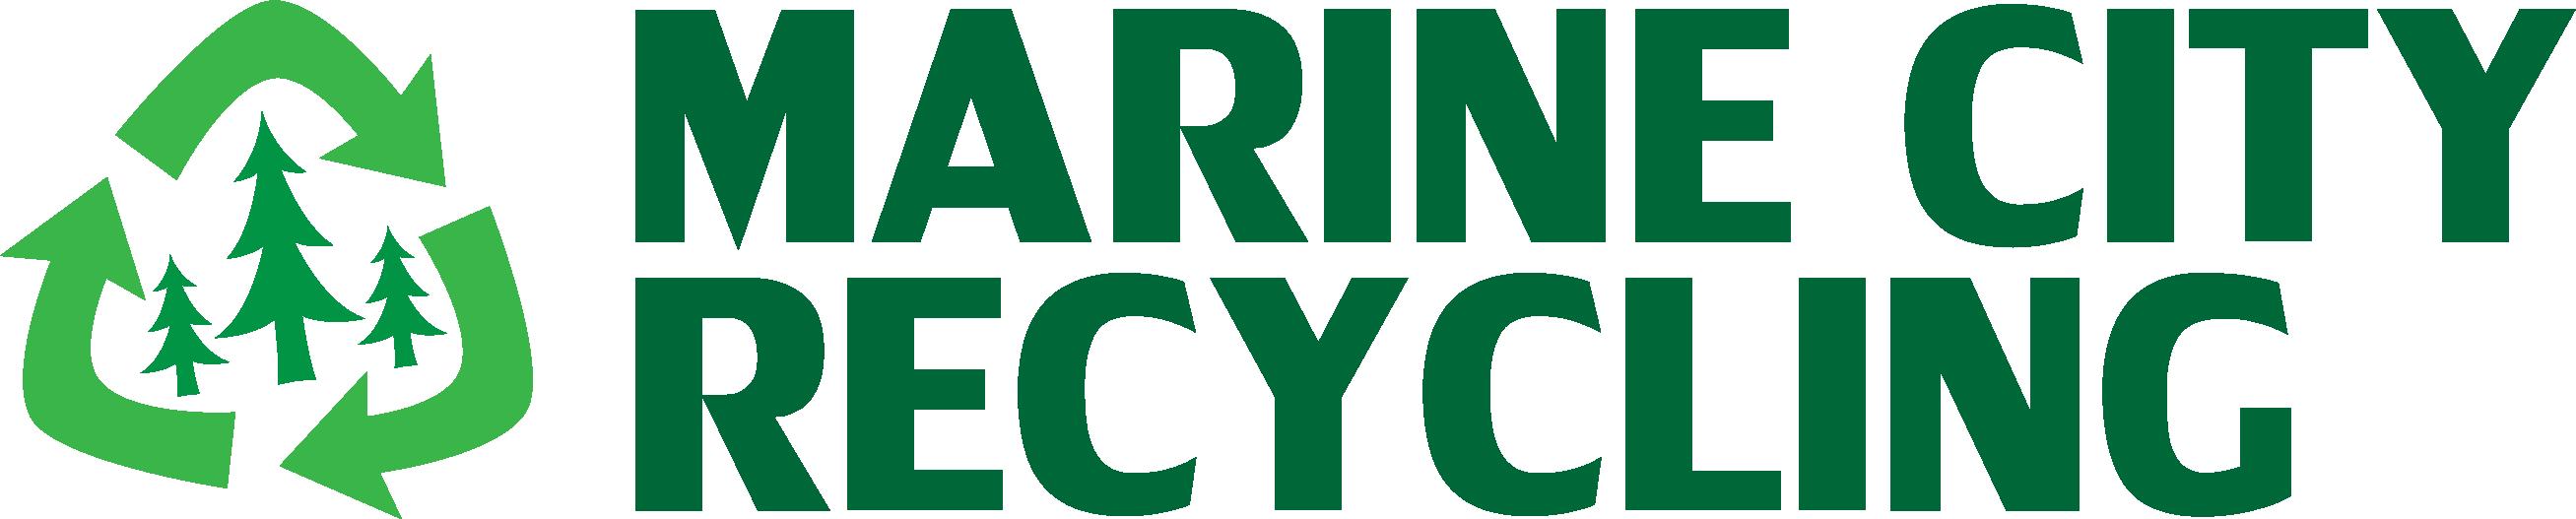 Marine City Recycling